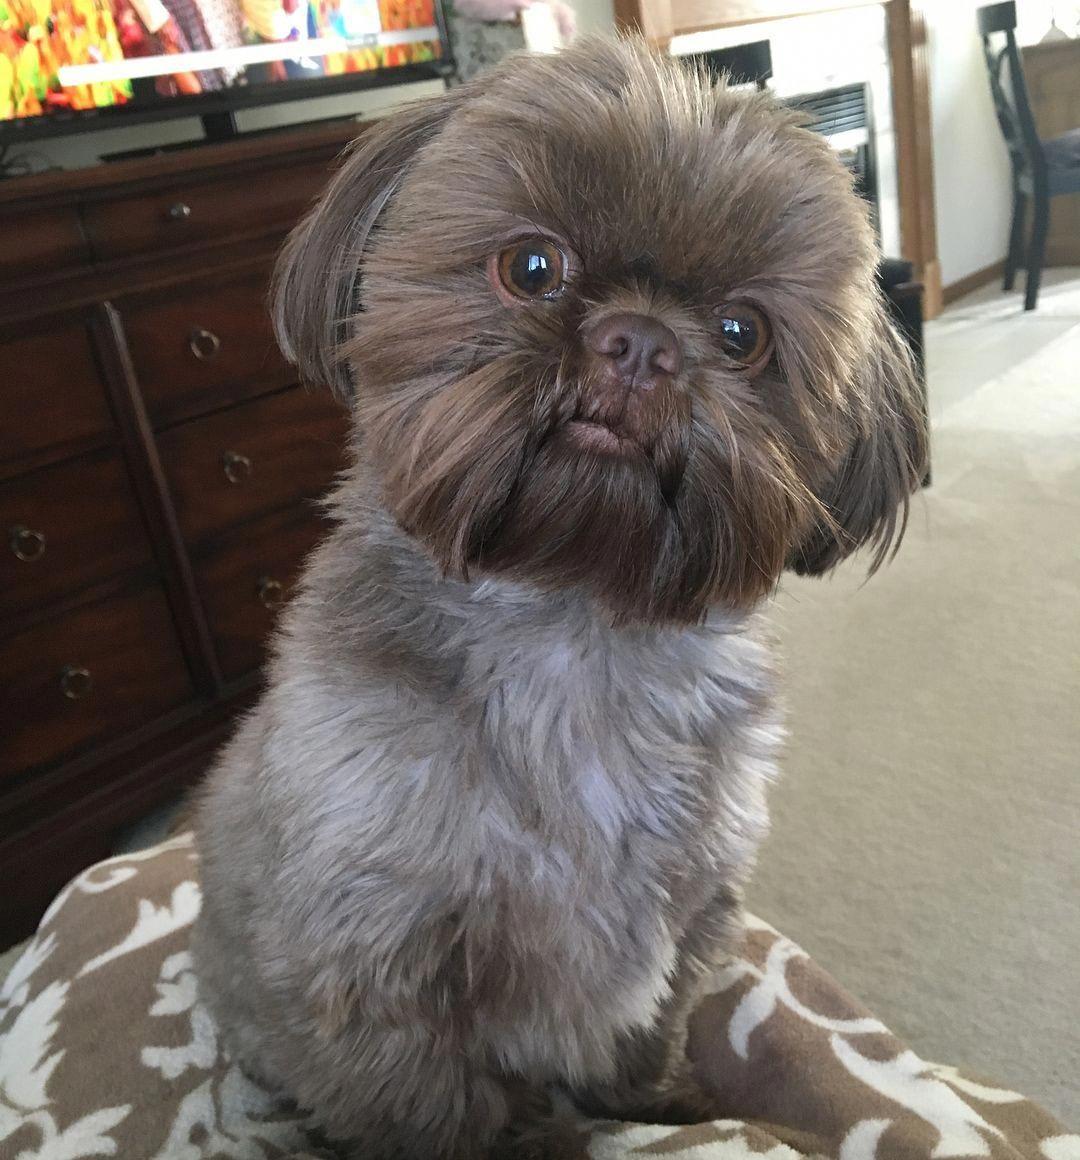 Shih Tzu Affectionate And Playful Shih Tzu Puppy Shih Tzu Dog Shih Tzu